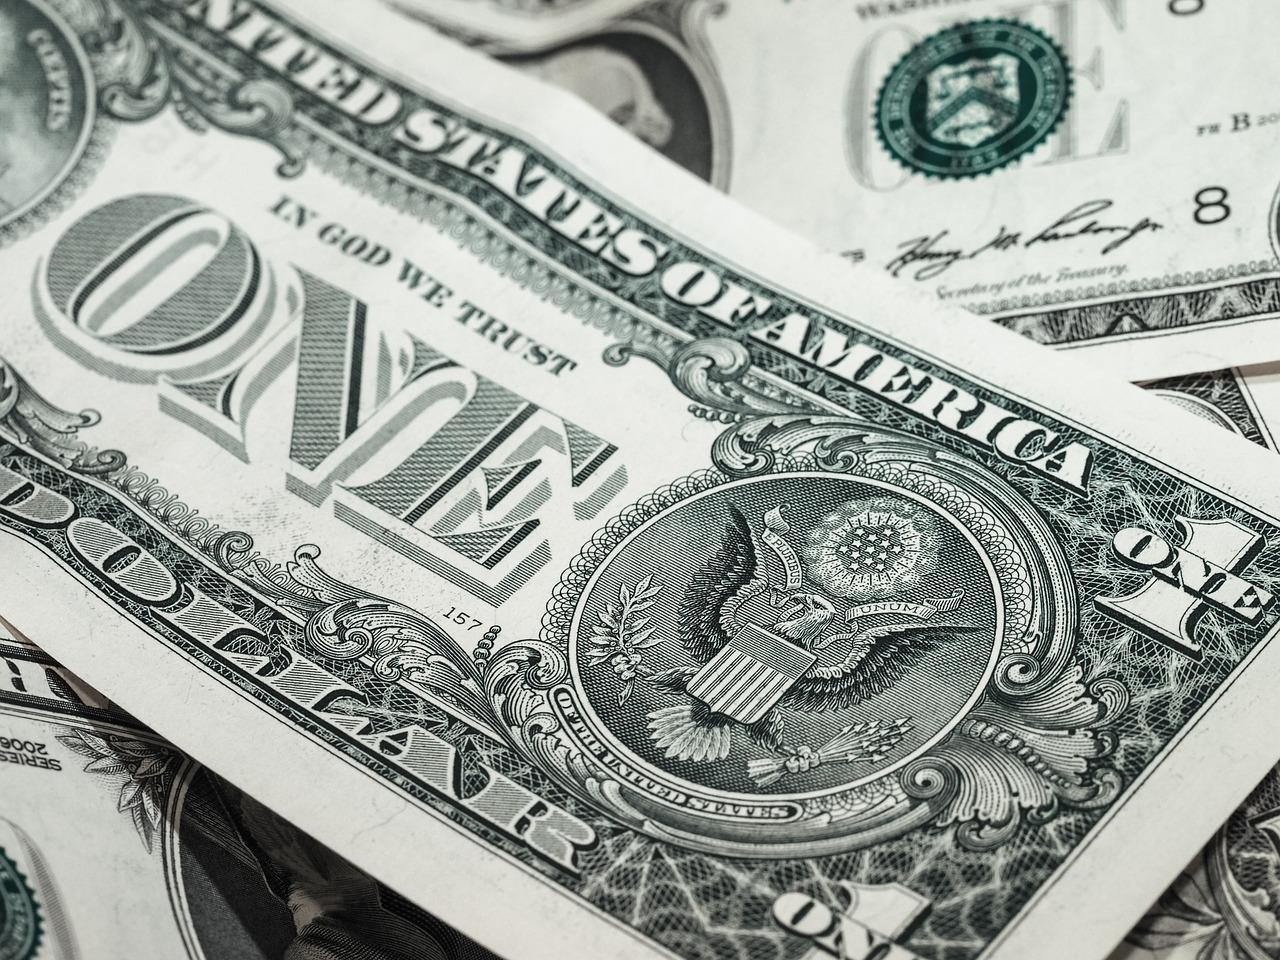 Subprimes : la Deutsche Bank pourrait verser 14 milliards de dollars